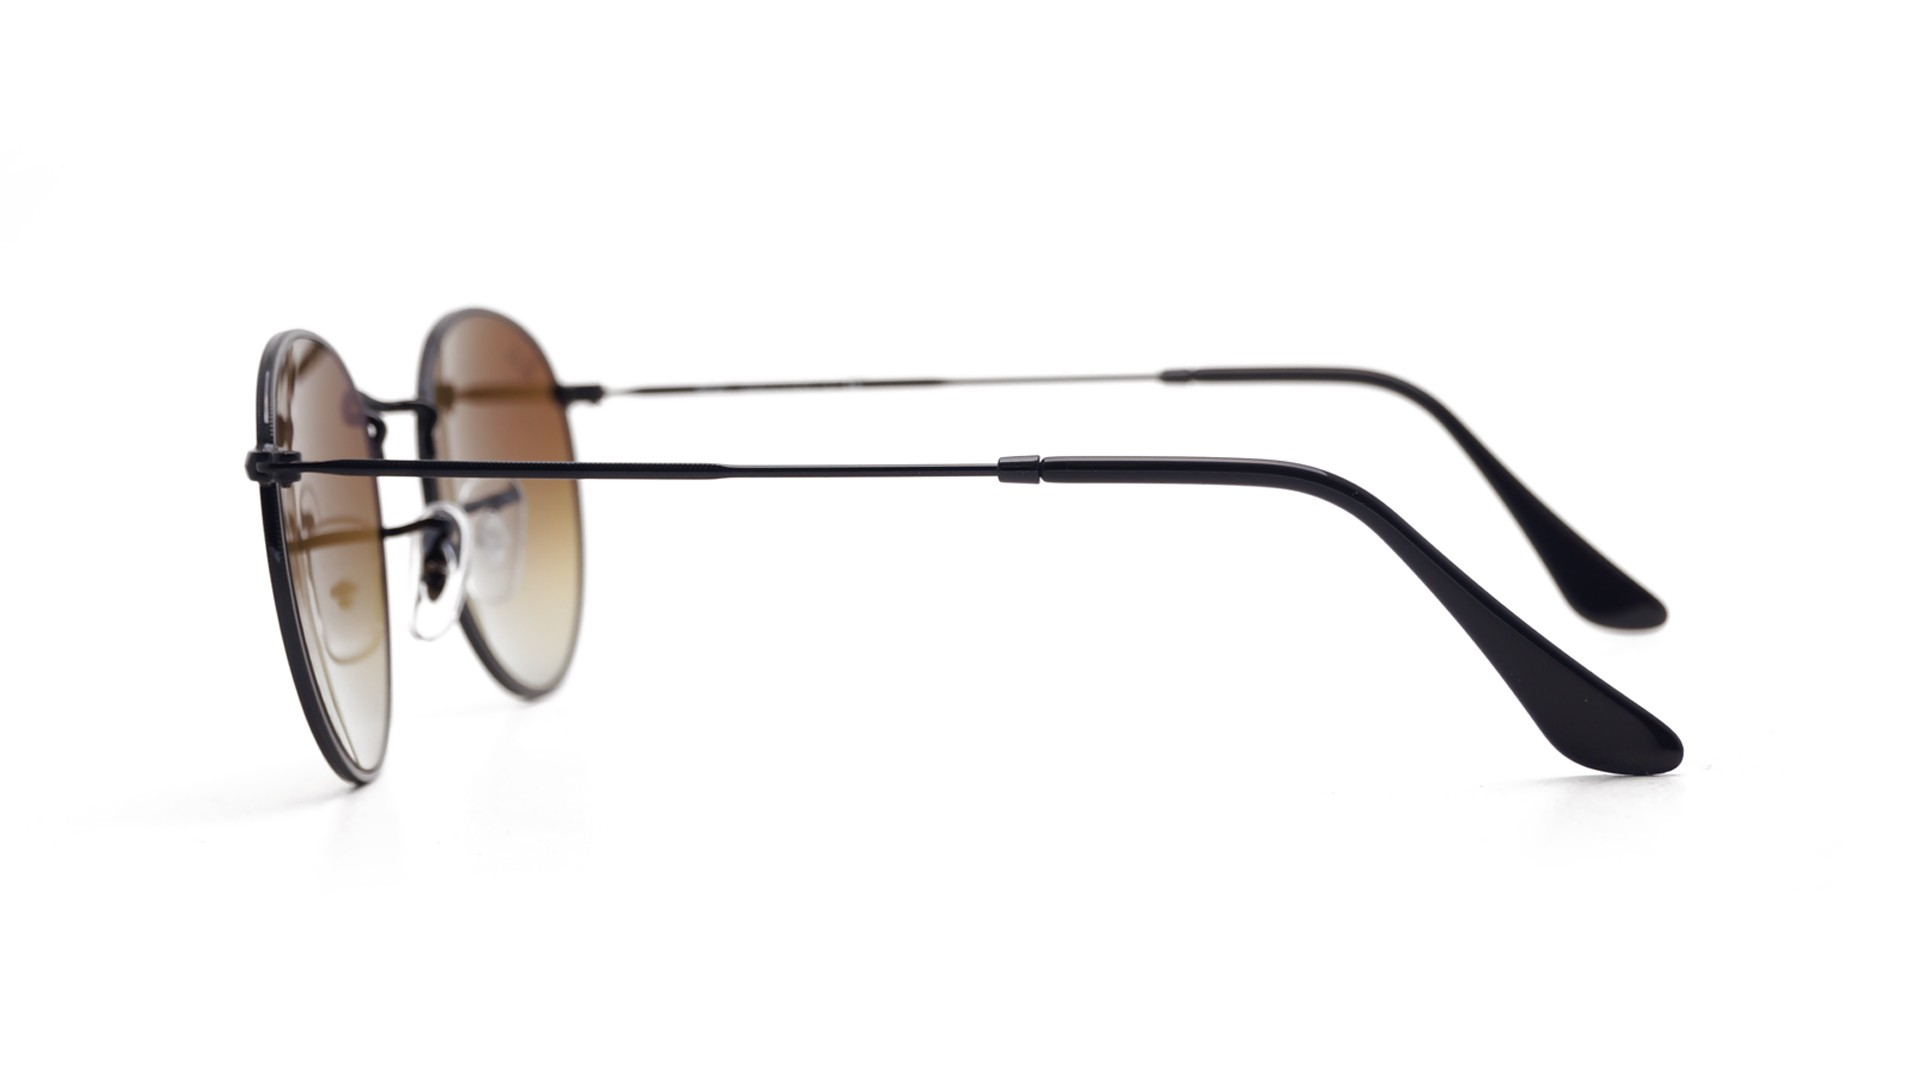 e8ec1c0a4 Ray-Ban Round Metal Black RB3447 002/4O 50-21 | Visiofactory